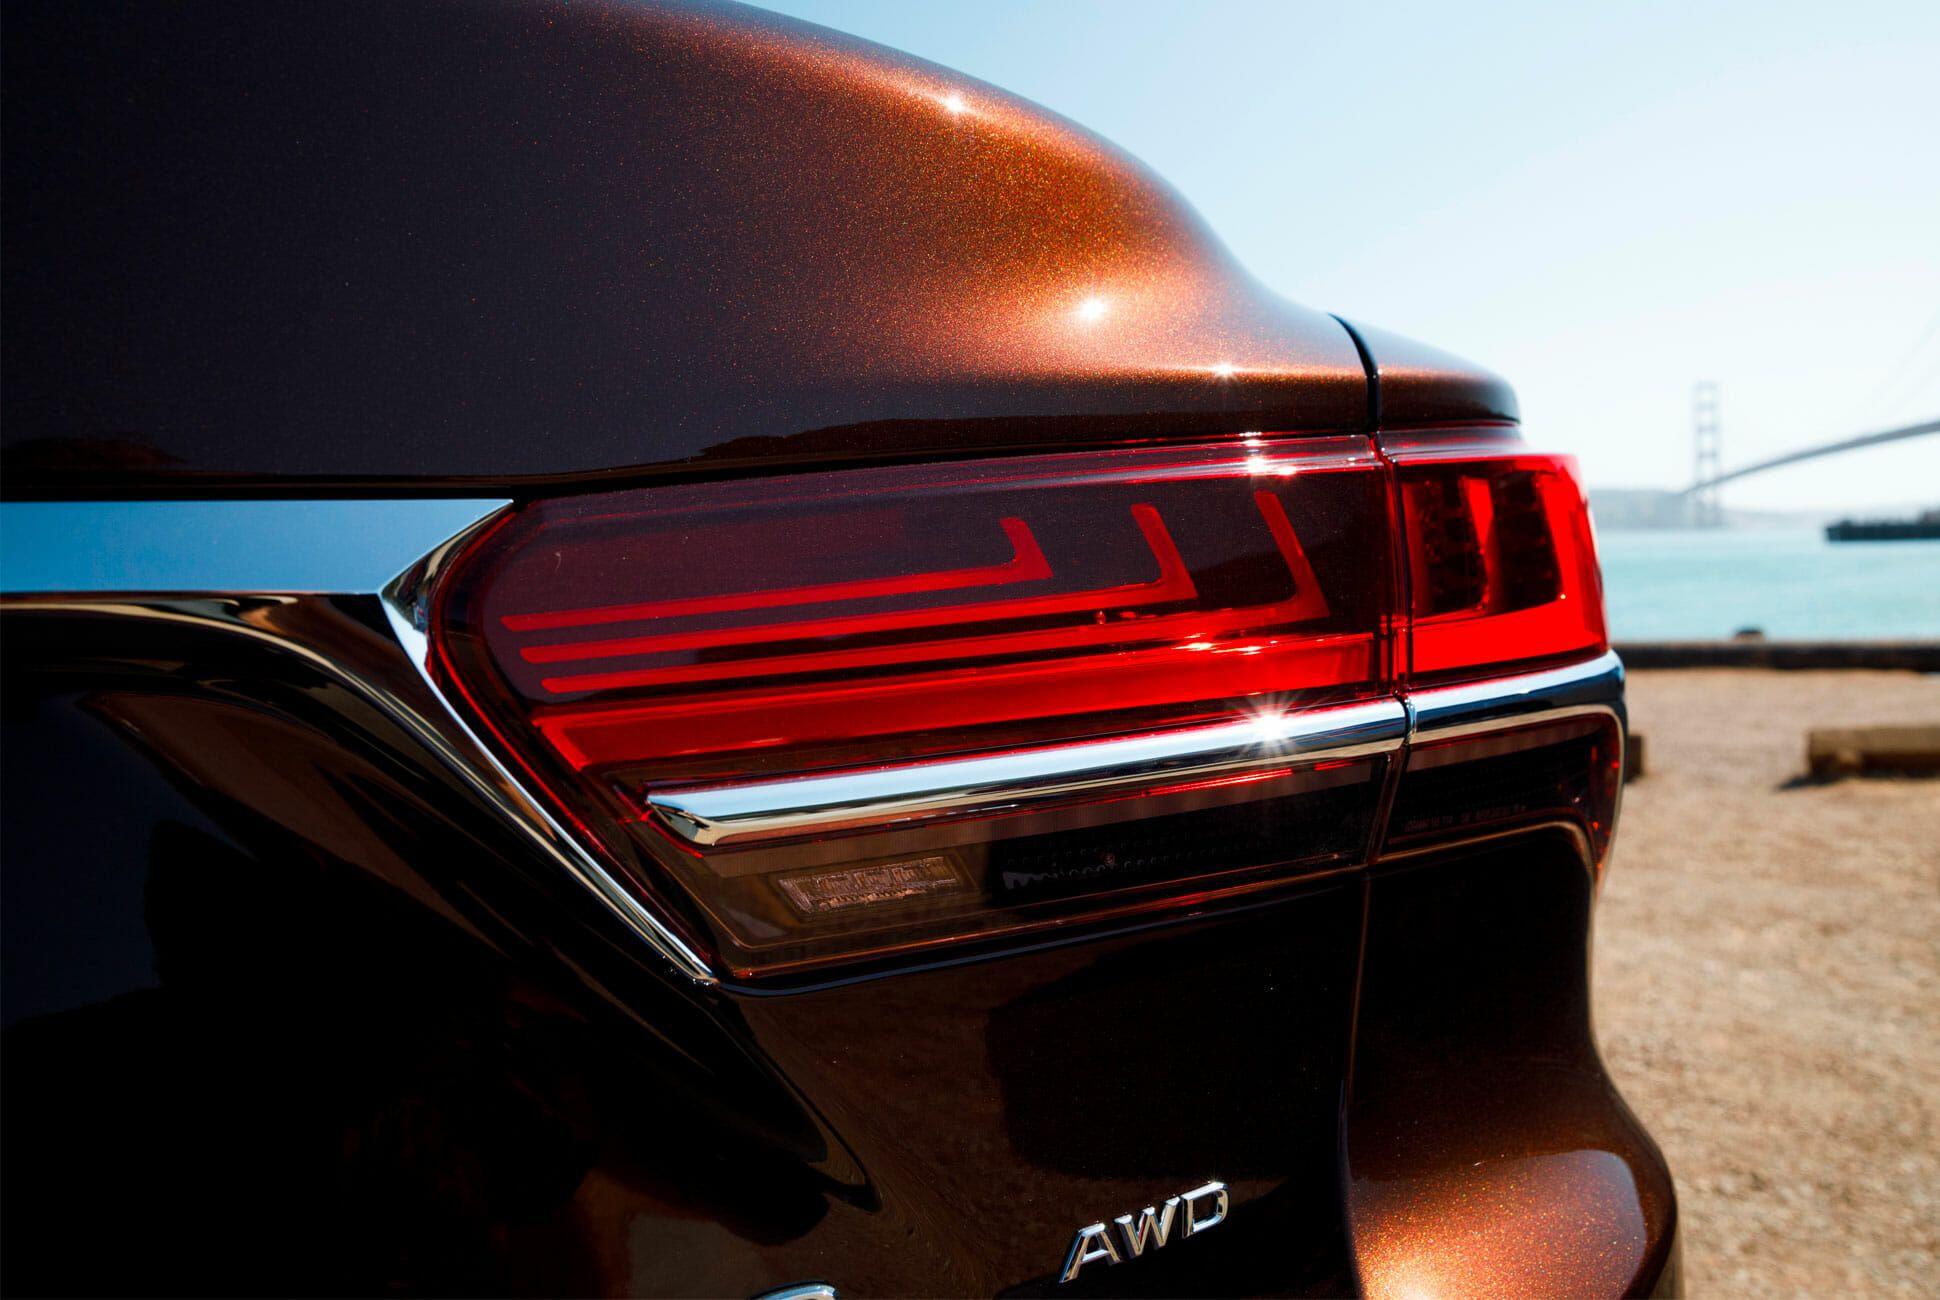 Lexus-LS-500-AWD-Review-gear-patrol-slide-4